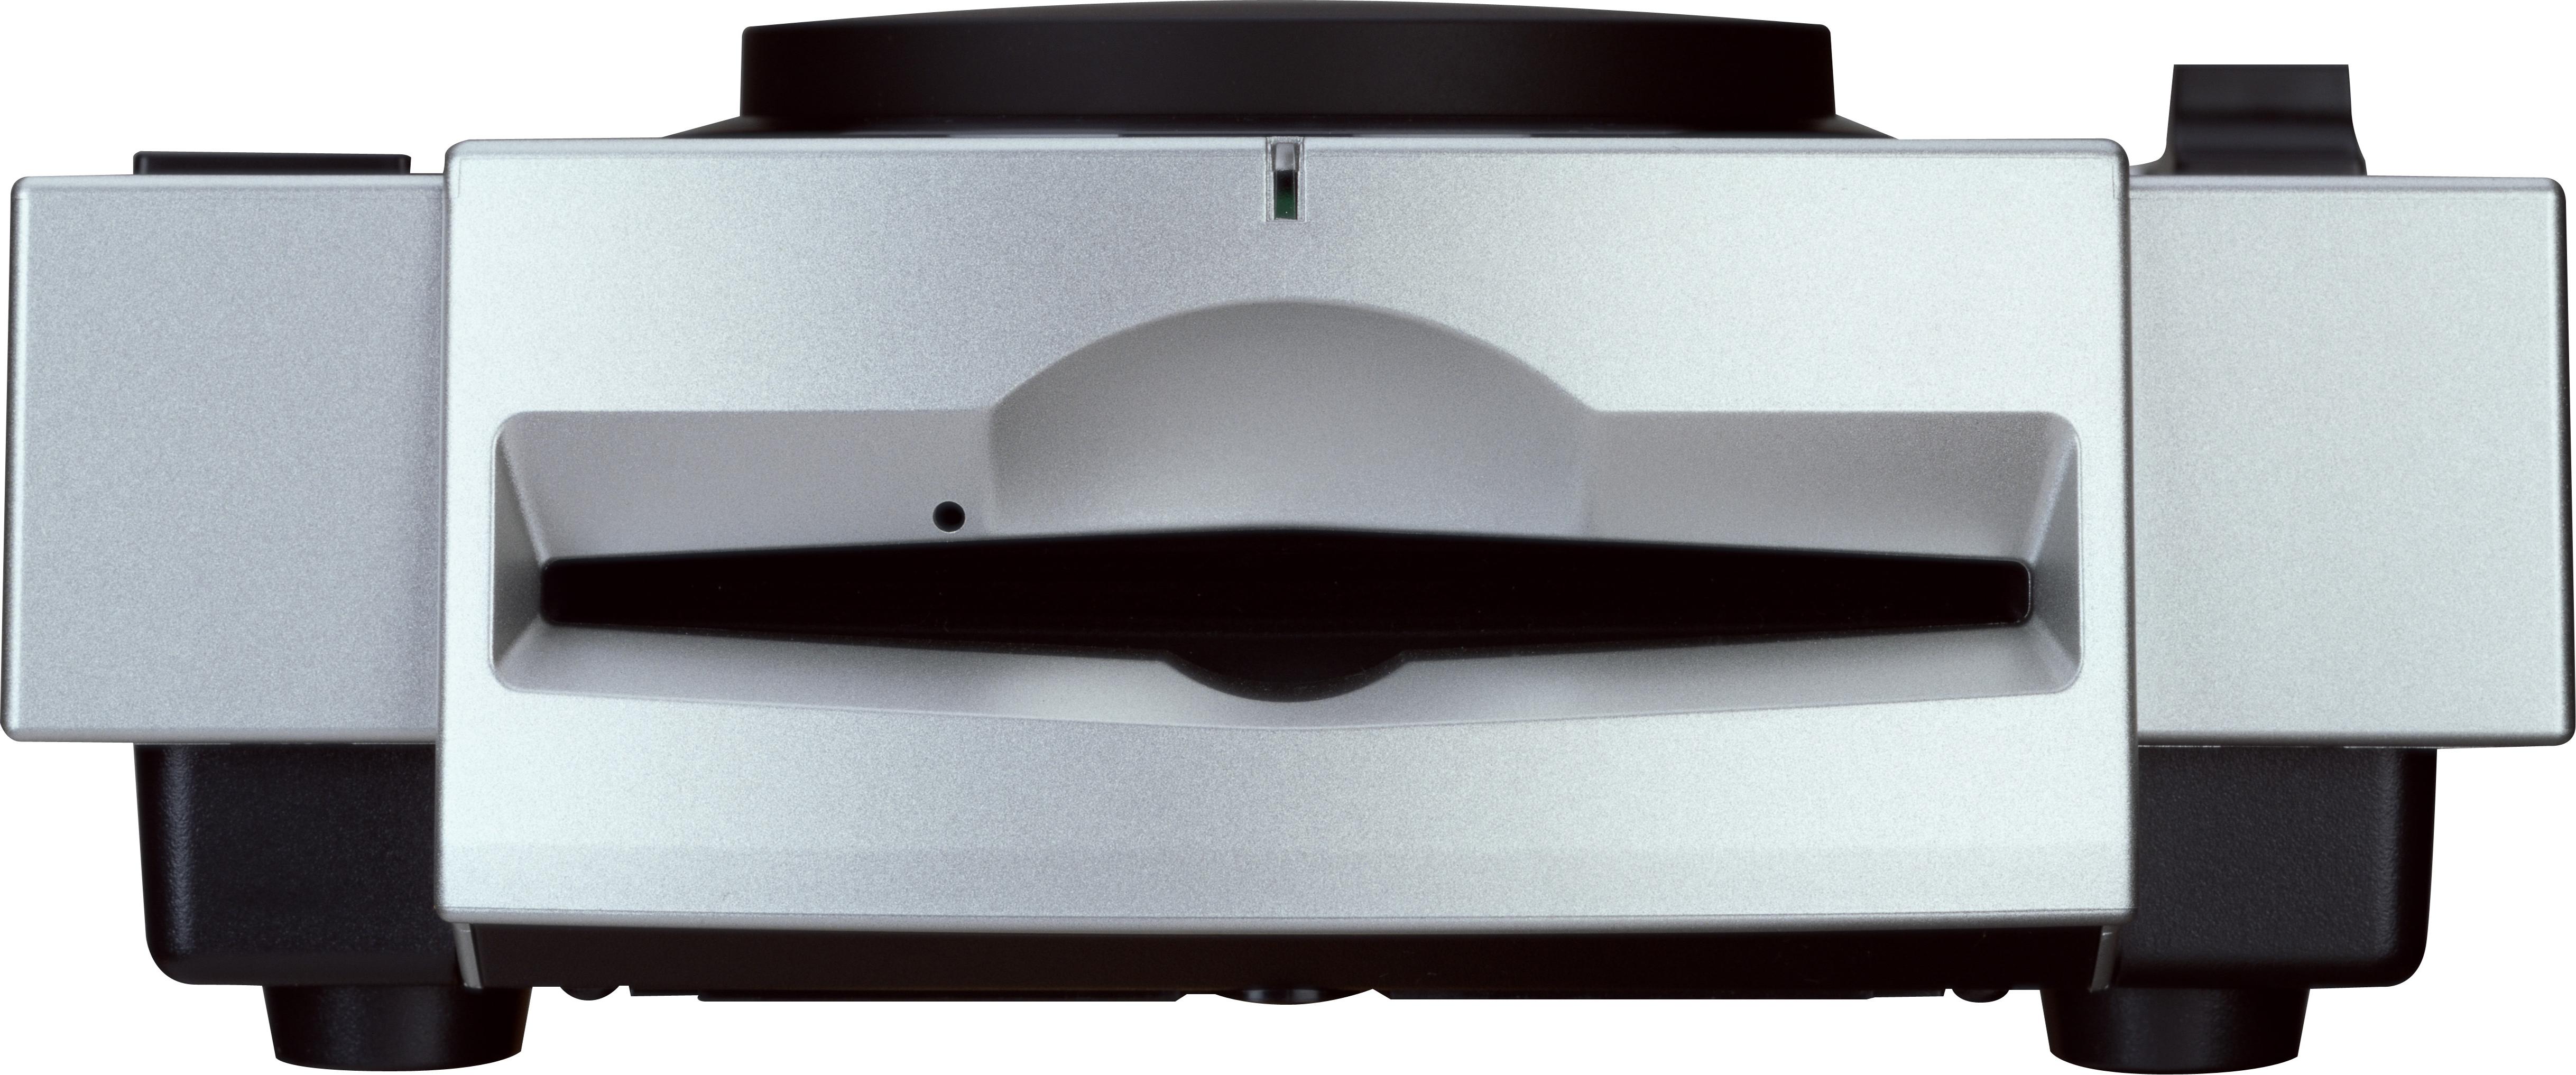 CDJ-100S front